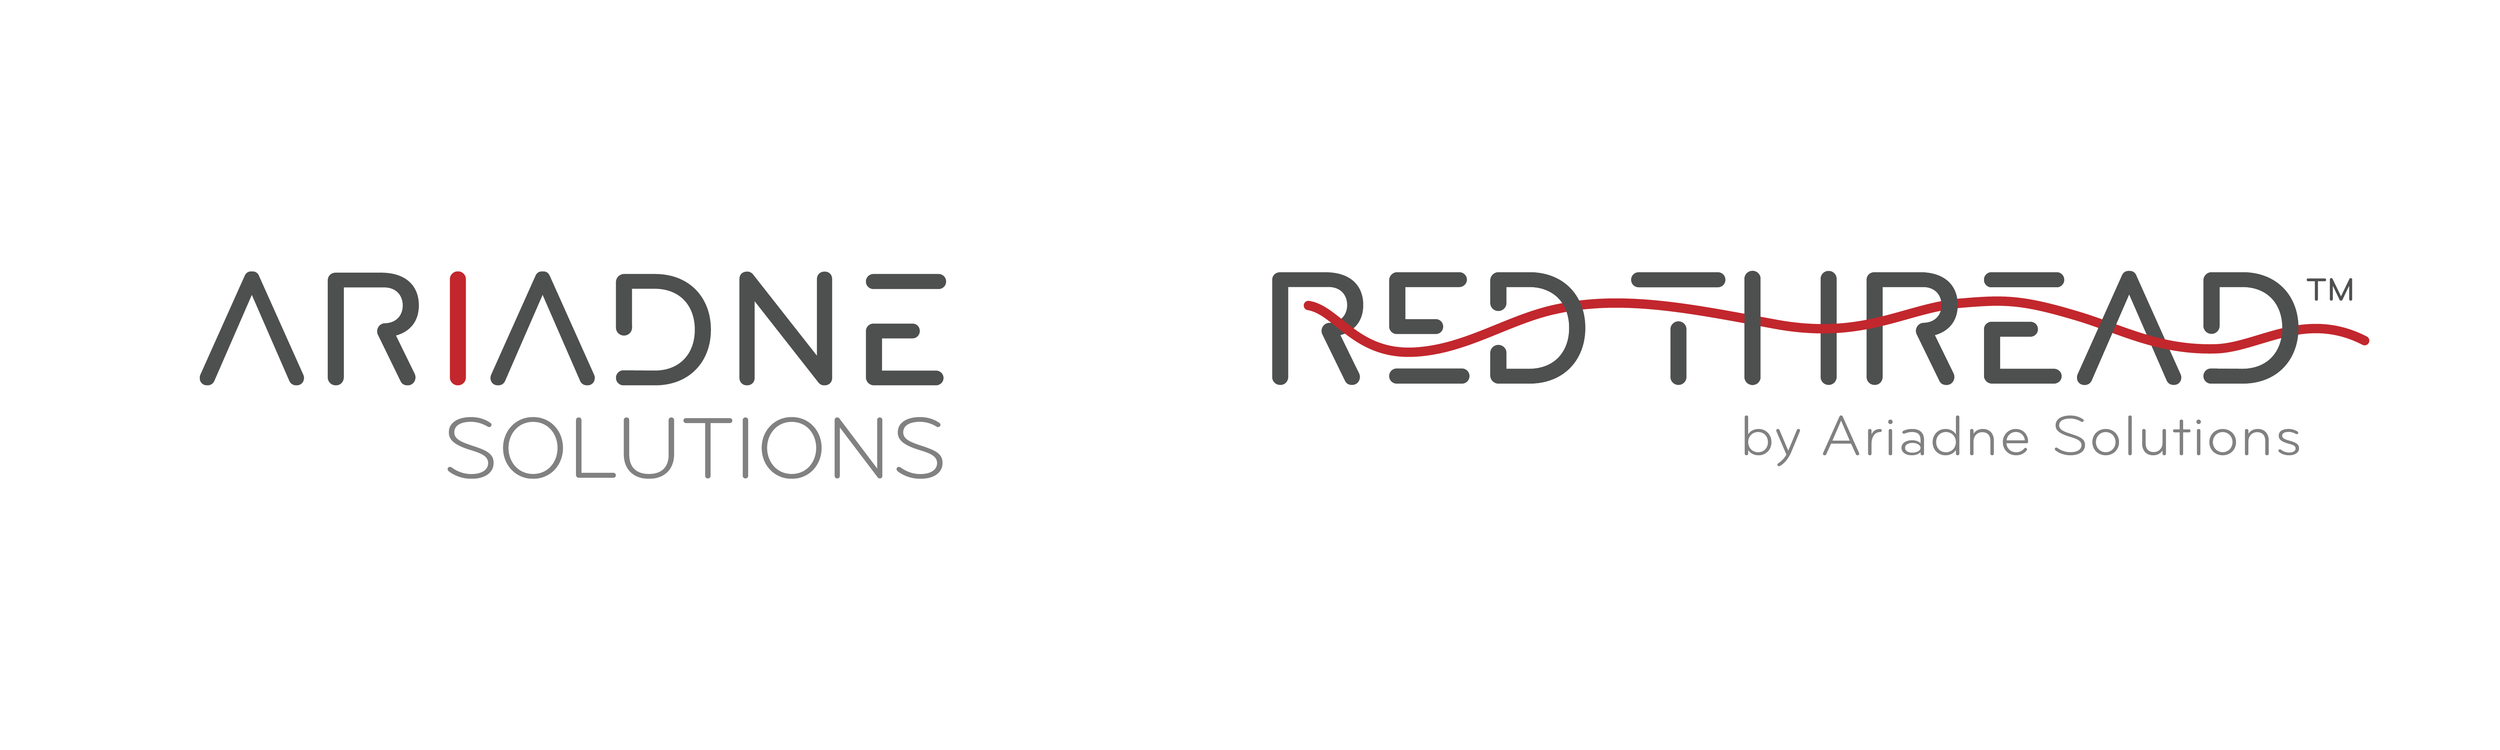 Ariadne-Red-Thread-Logos.png